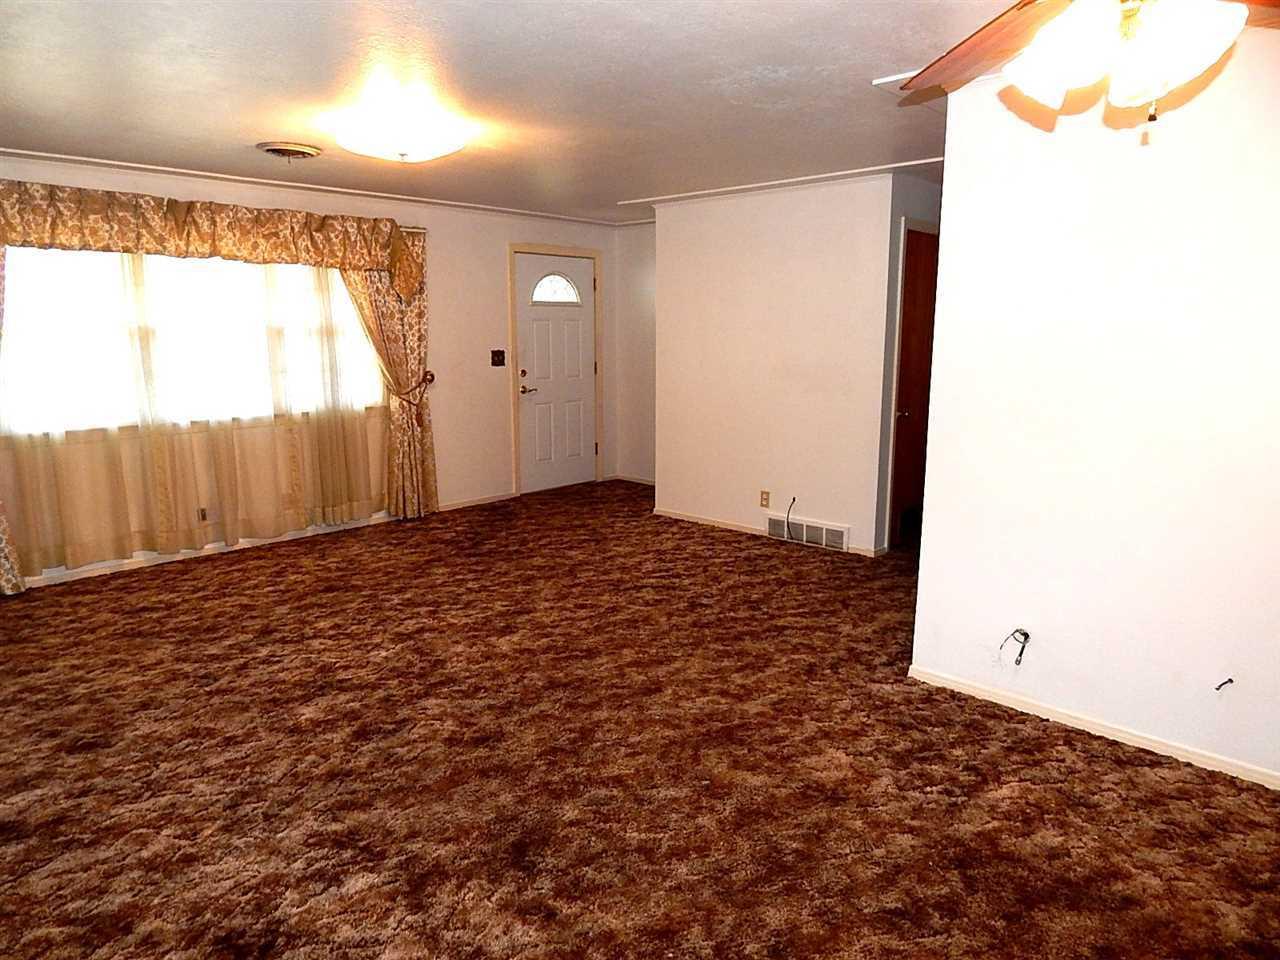 Sold Cross Sale W/ MLS | 720 N 14th Ponca City, OK 74601 4